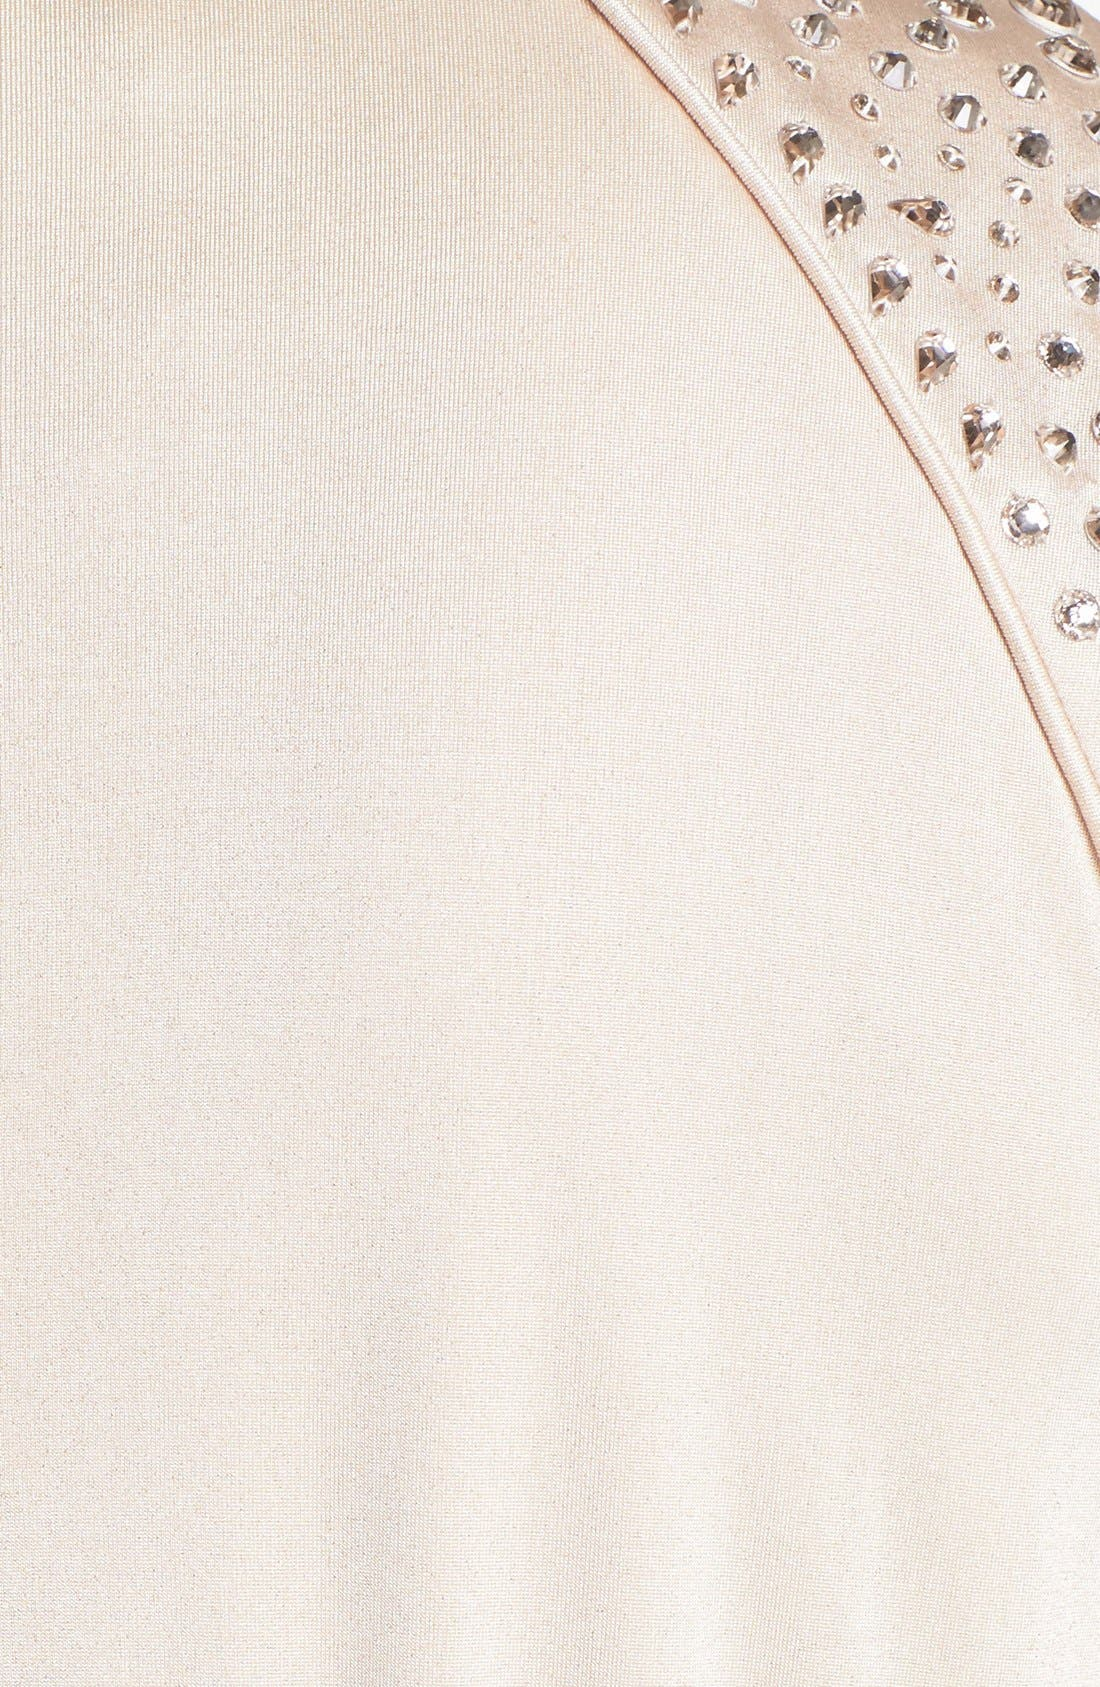 Alternate Image 3  - Vince Camuto Embellished Faux Wrap Dress (Plus Size)